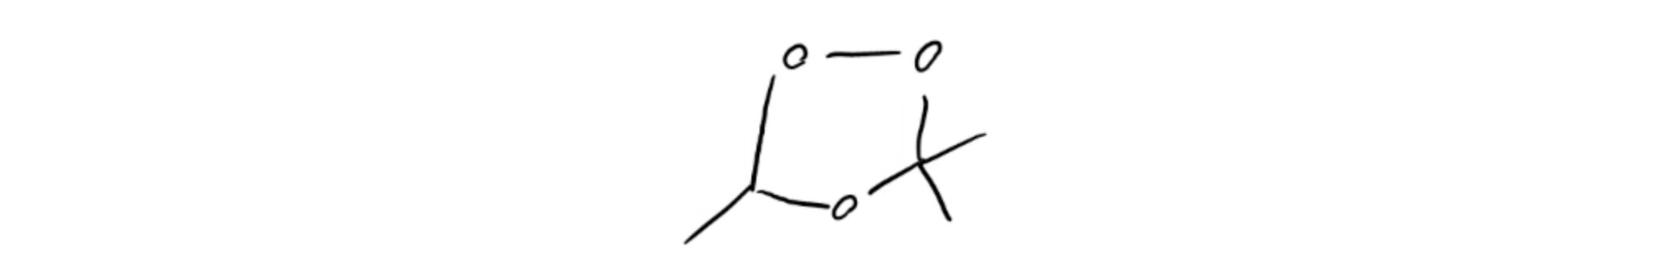 Ozonide-Intermediate